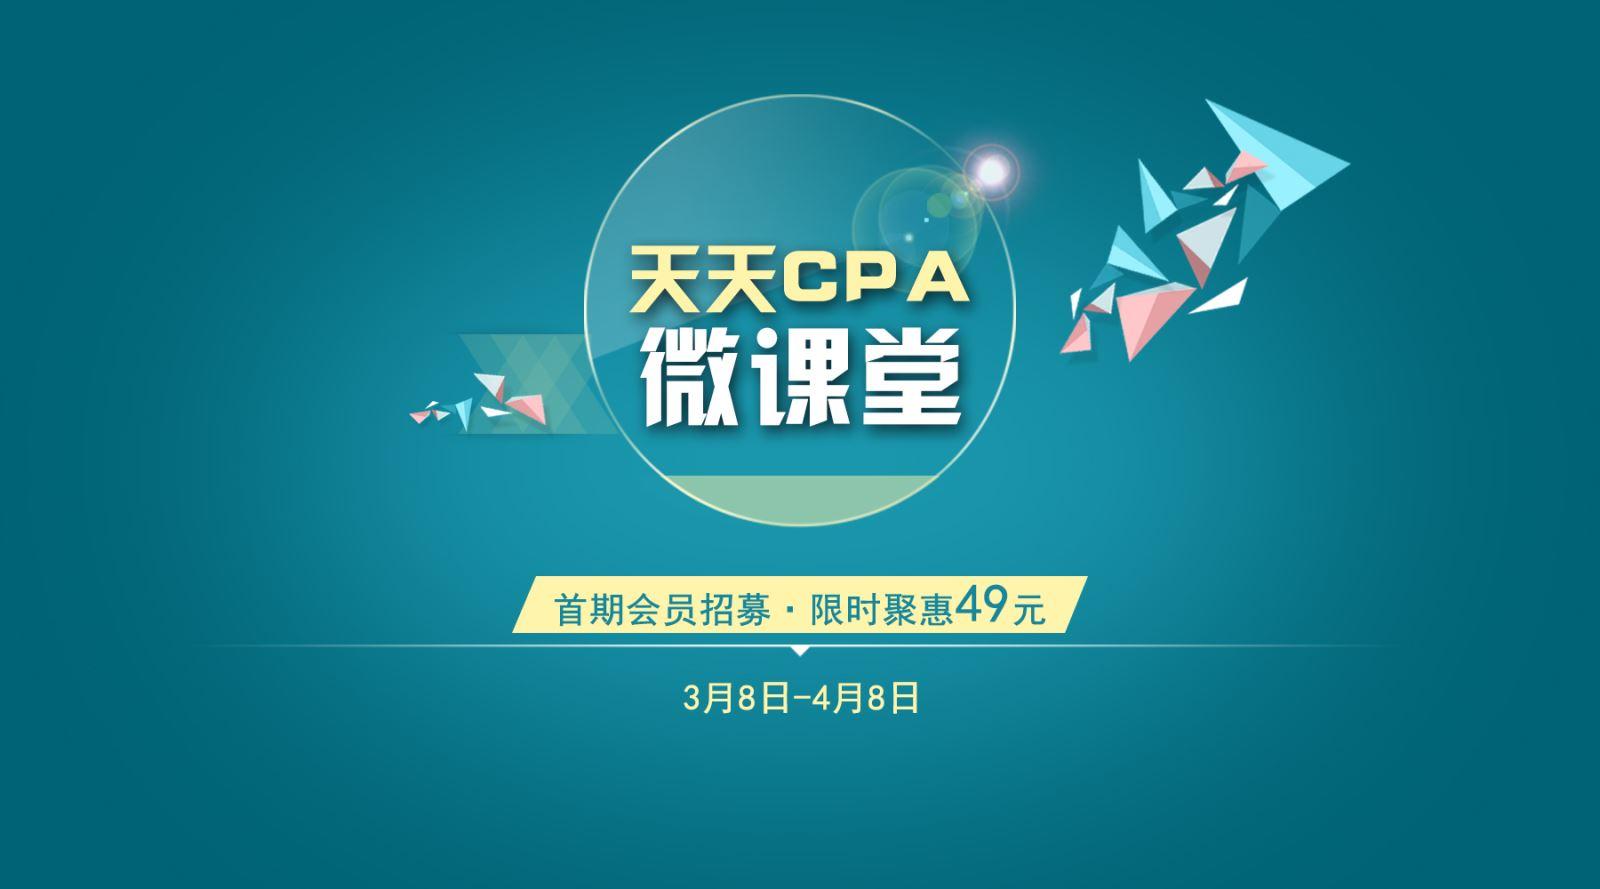 CPA微信直播